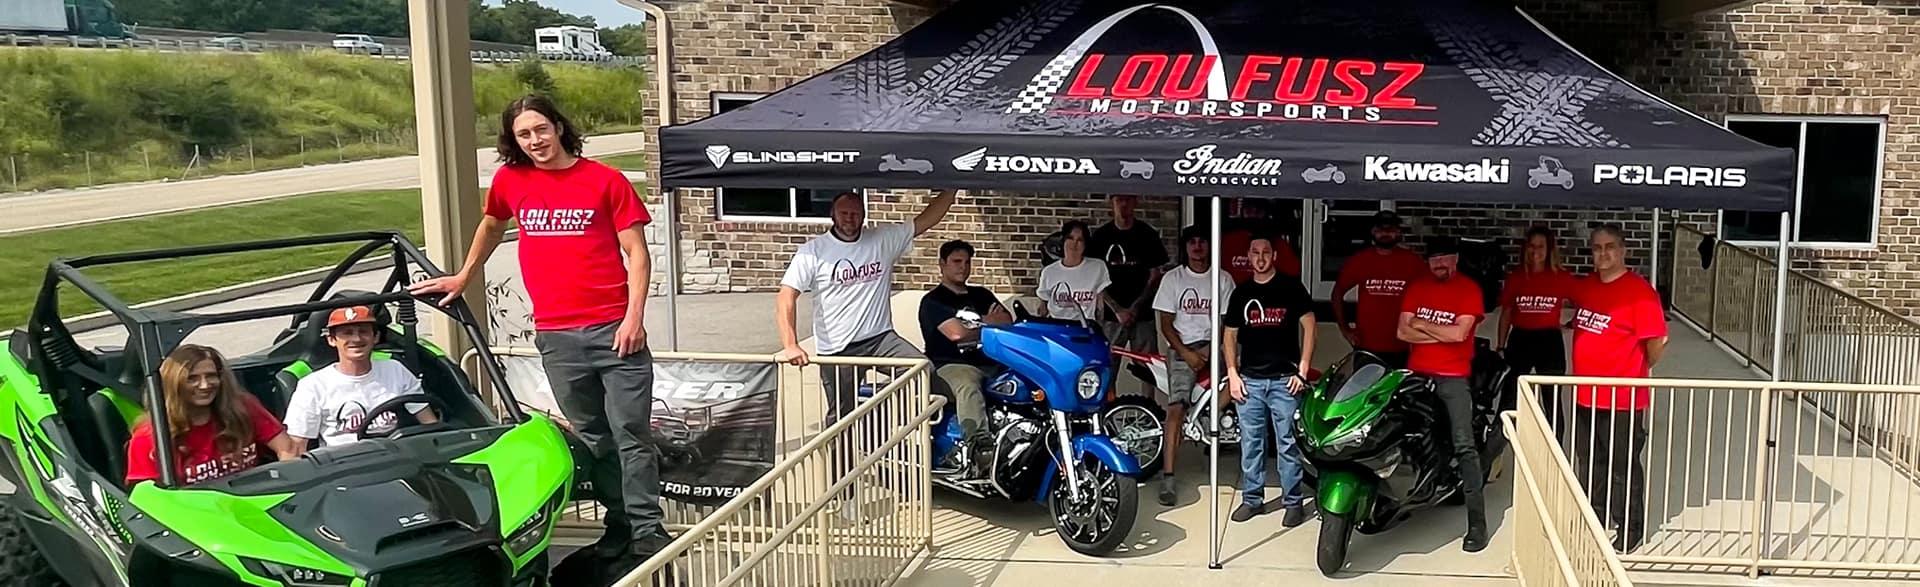 About Lou Fusz Motorsports